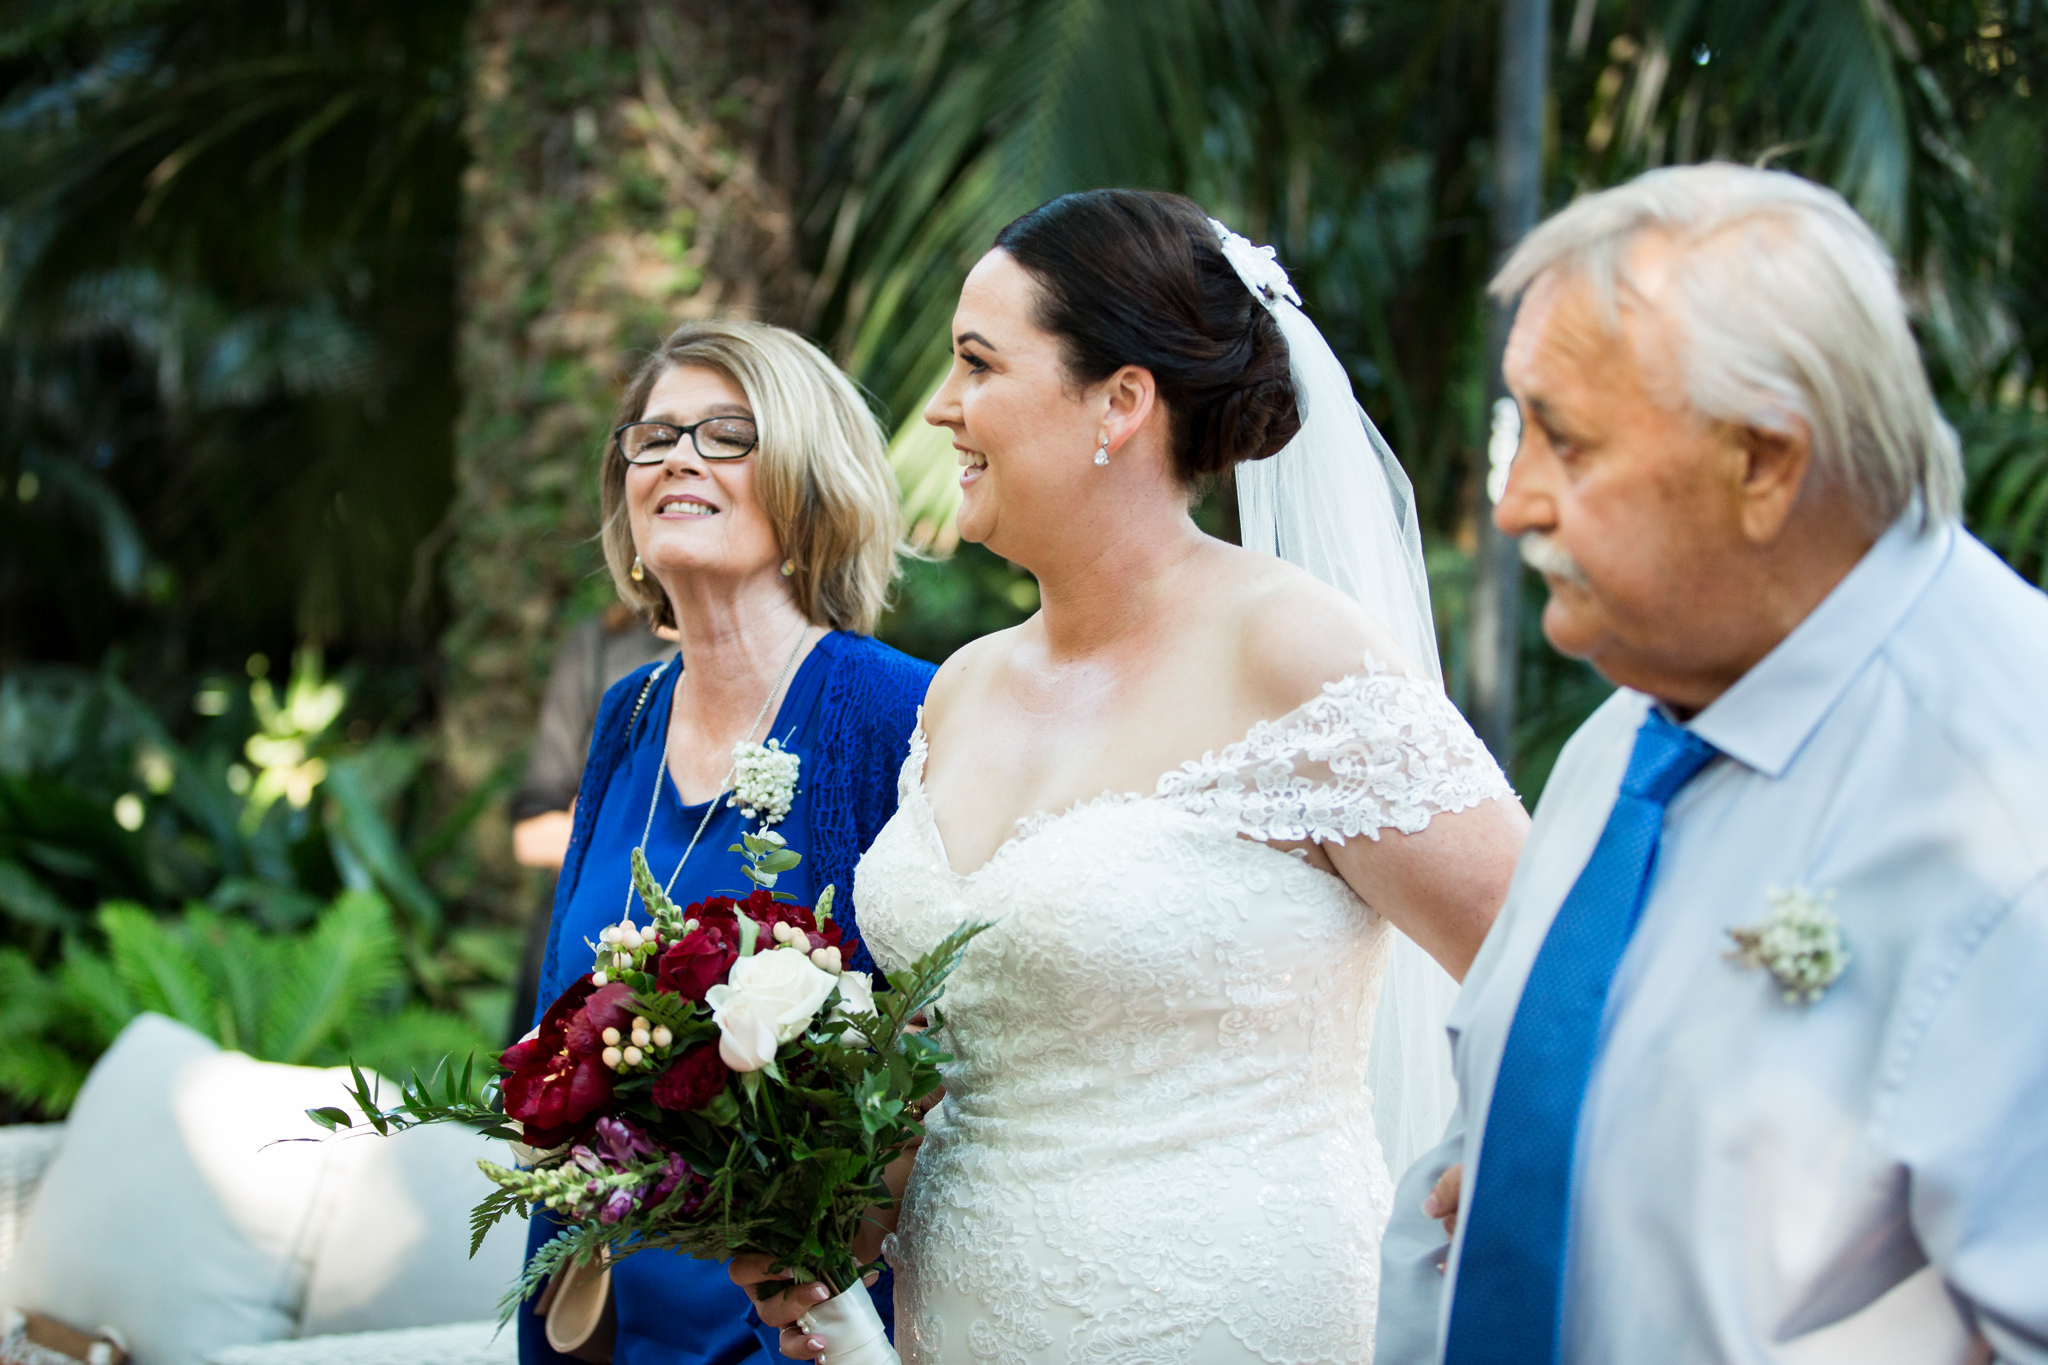 Kyme-steve-wedding-44.jpg